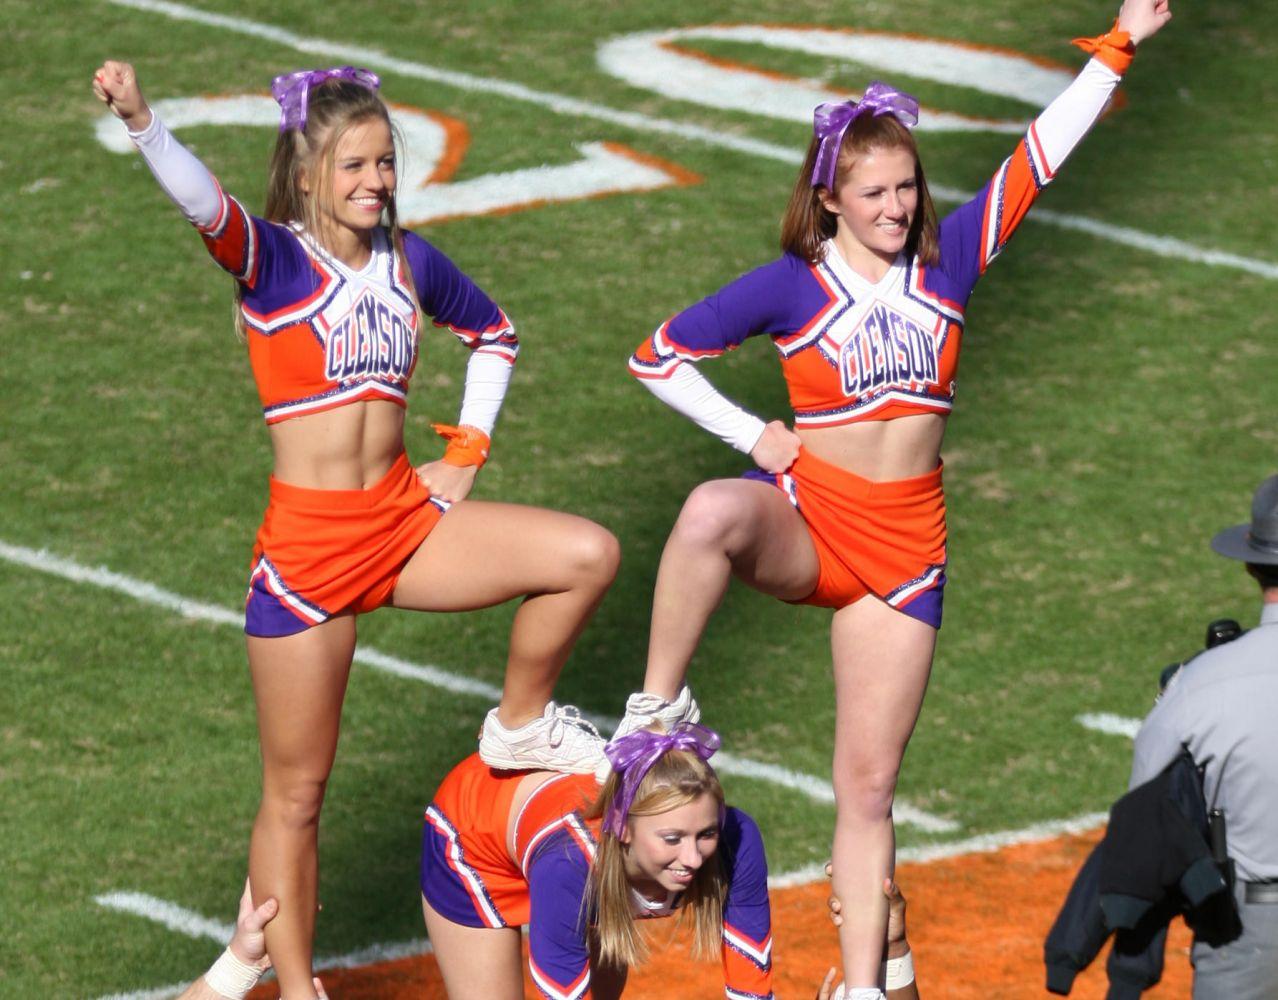 cheerleader-coach-topless-pictures